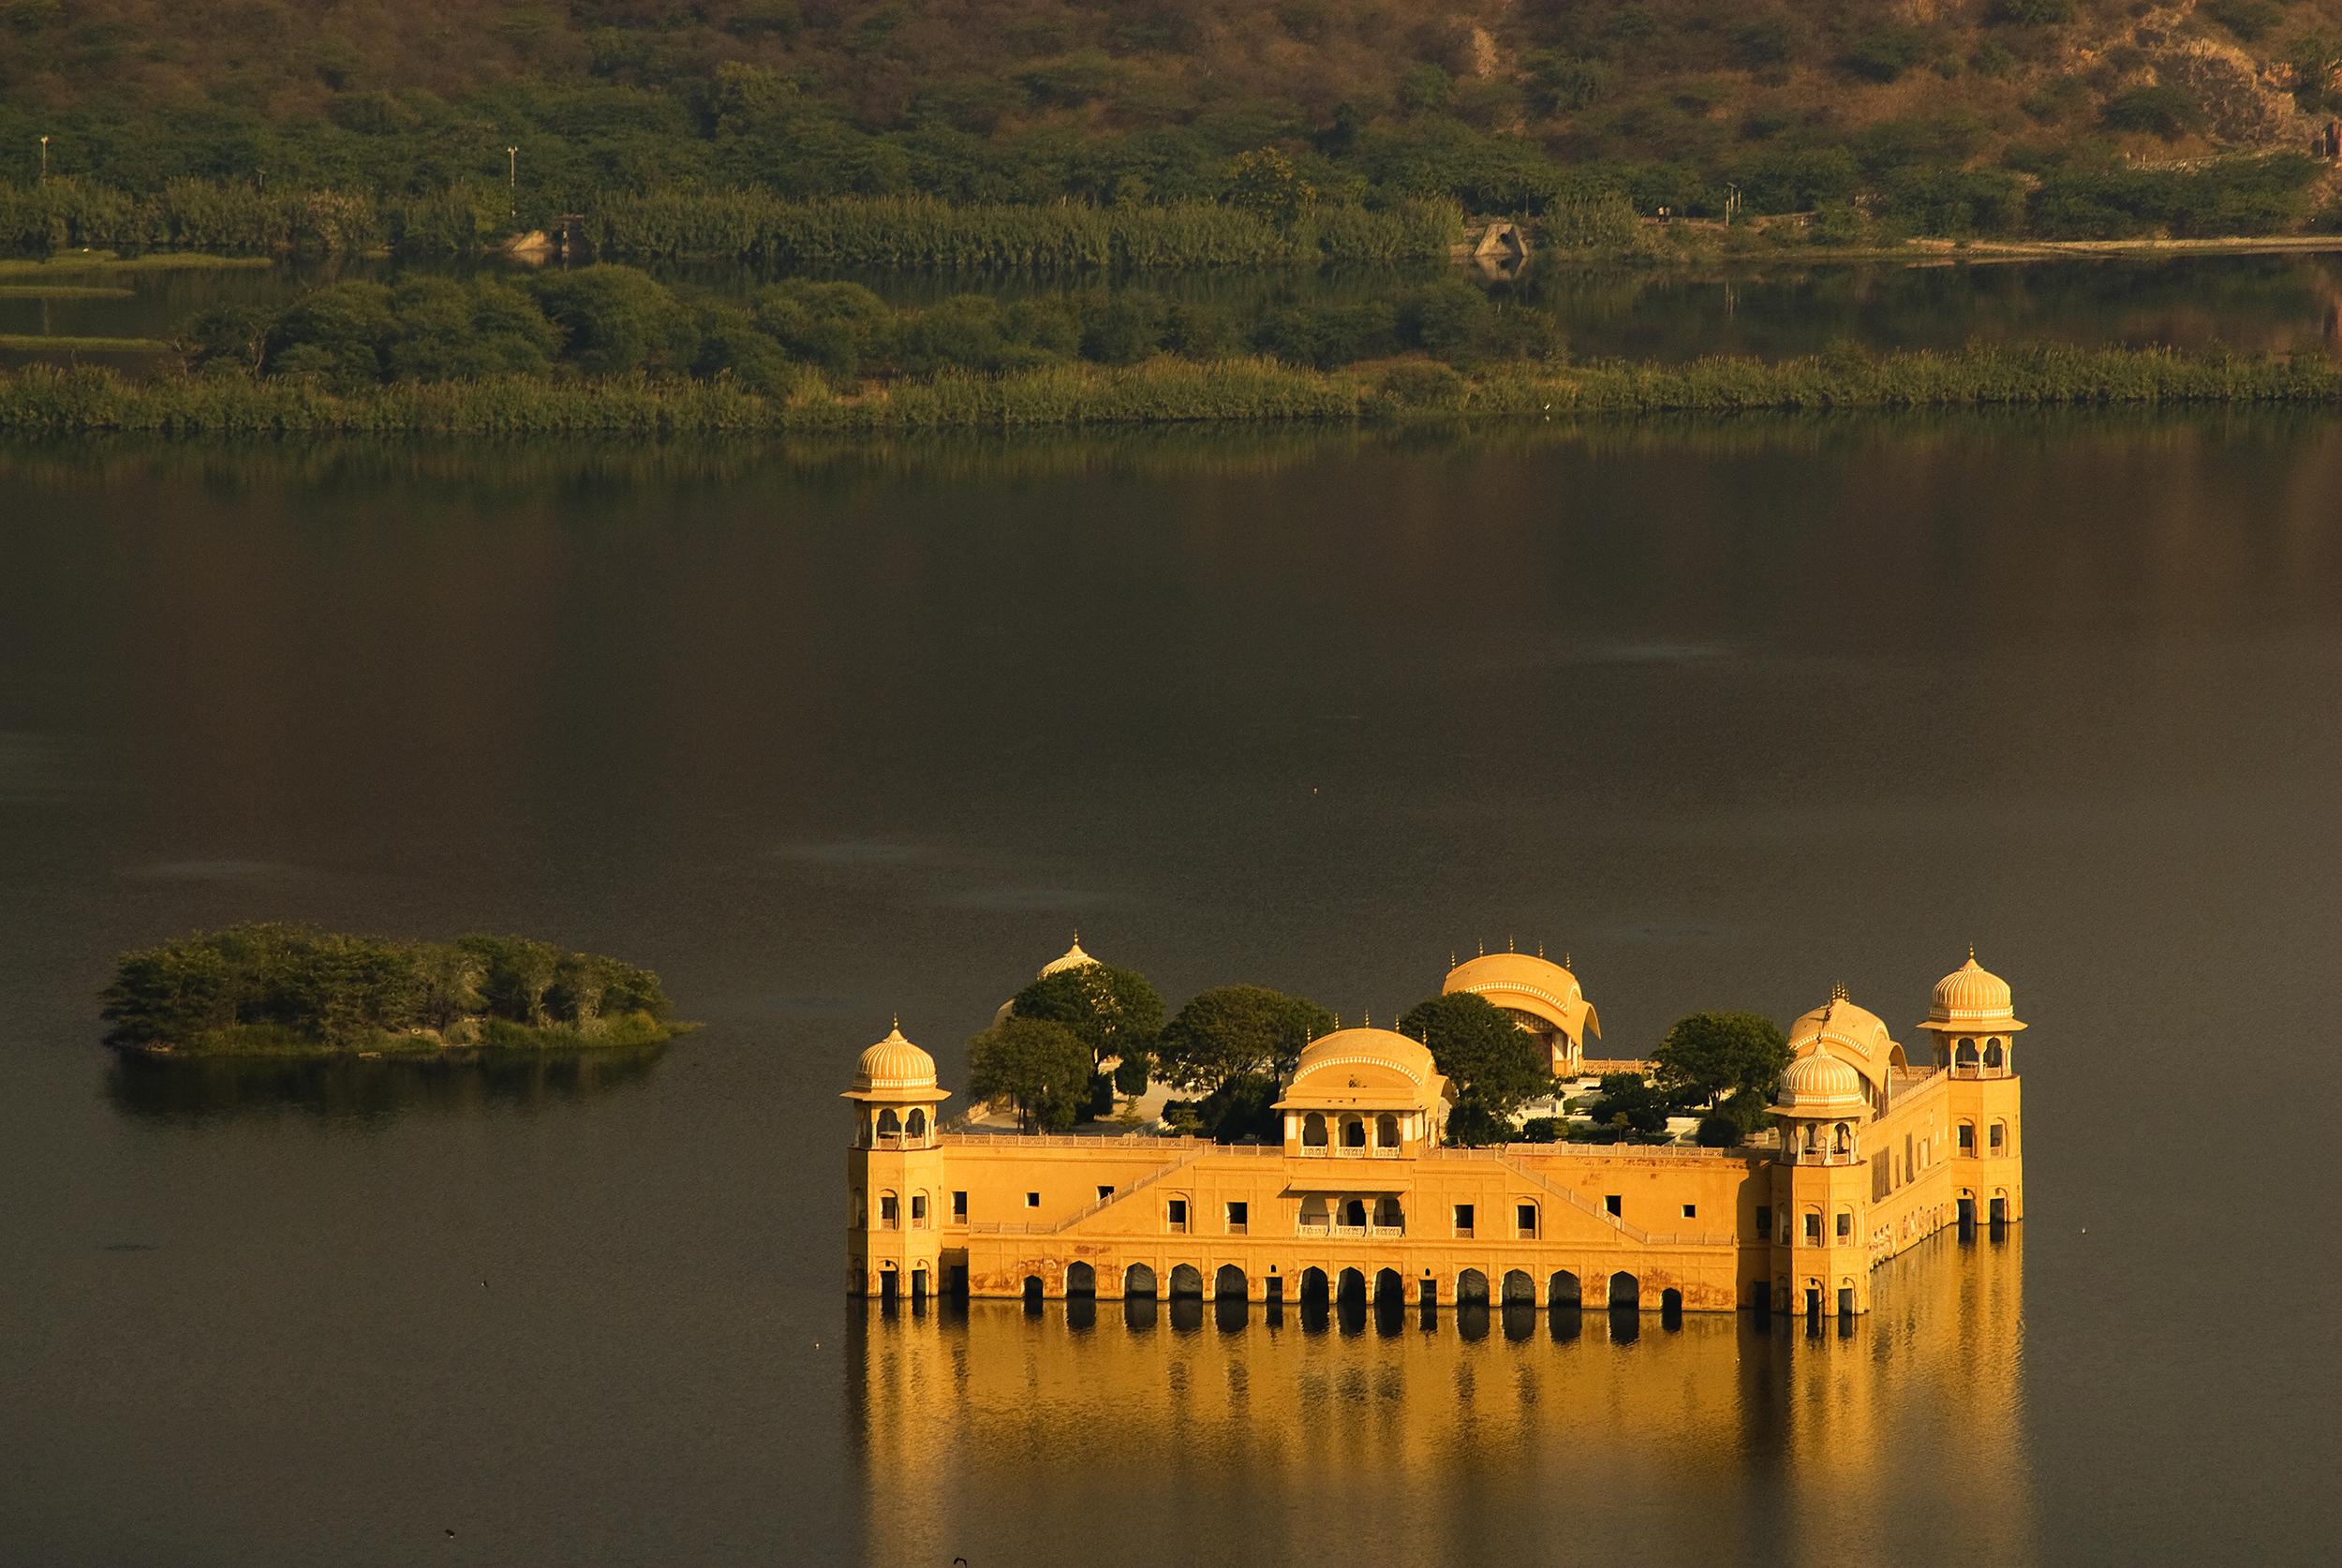 An Indian Wonder Hidden Under Water The Jal Mahal Palace